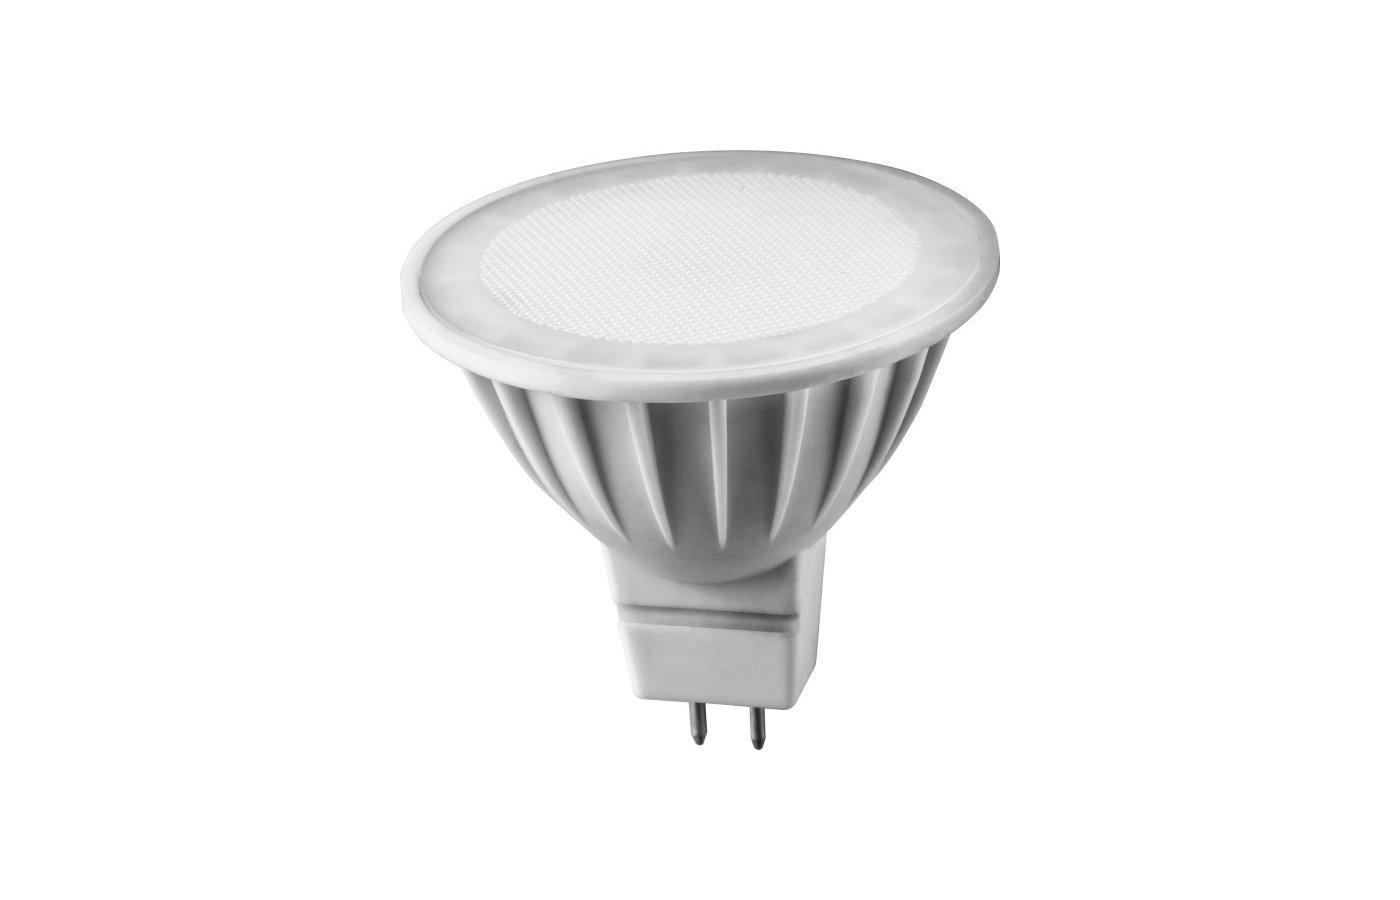 Лампочки LED ОНЛАЙТ LED 641 OLL-MR16-7-230-4K-GU5.3